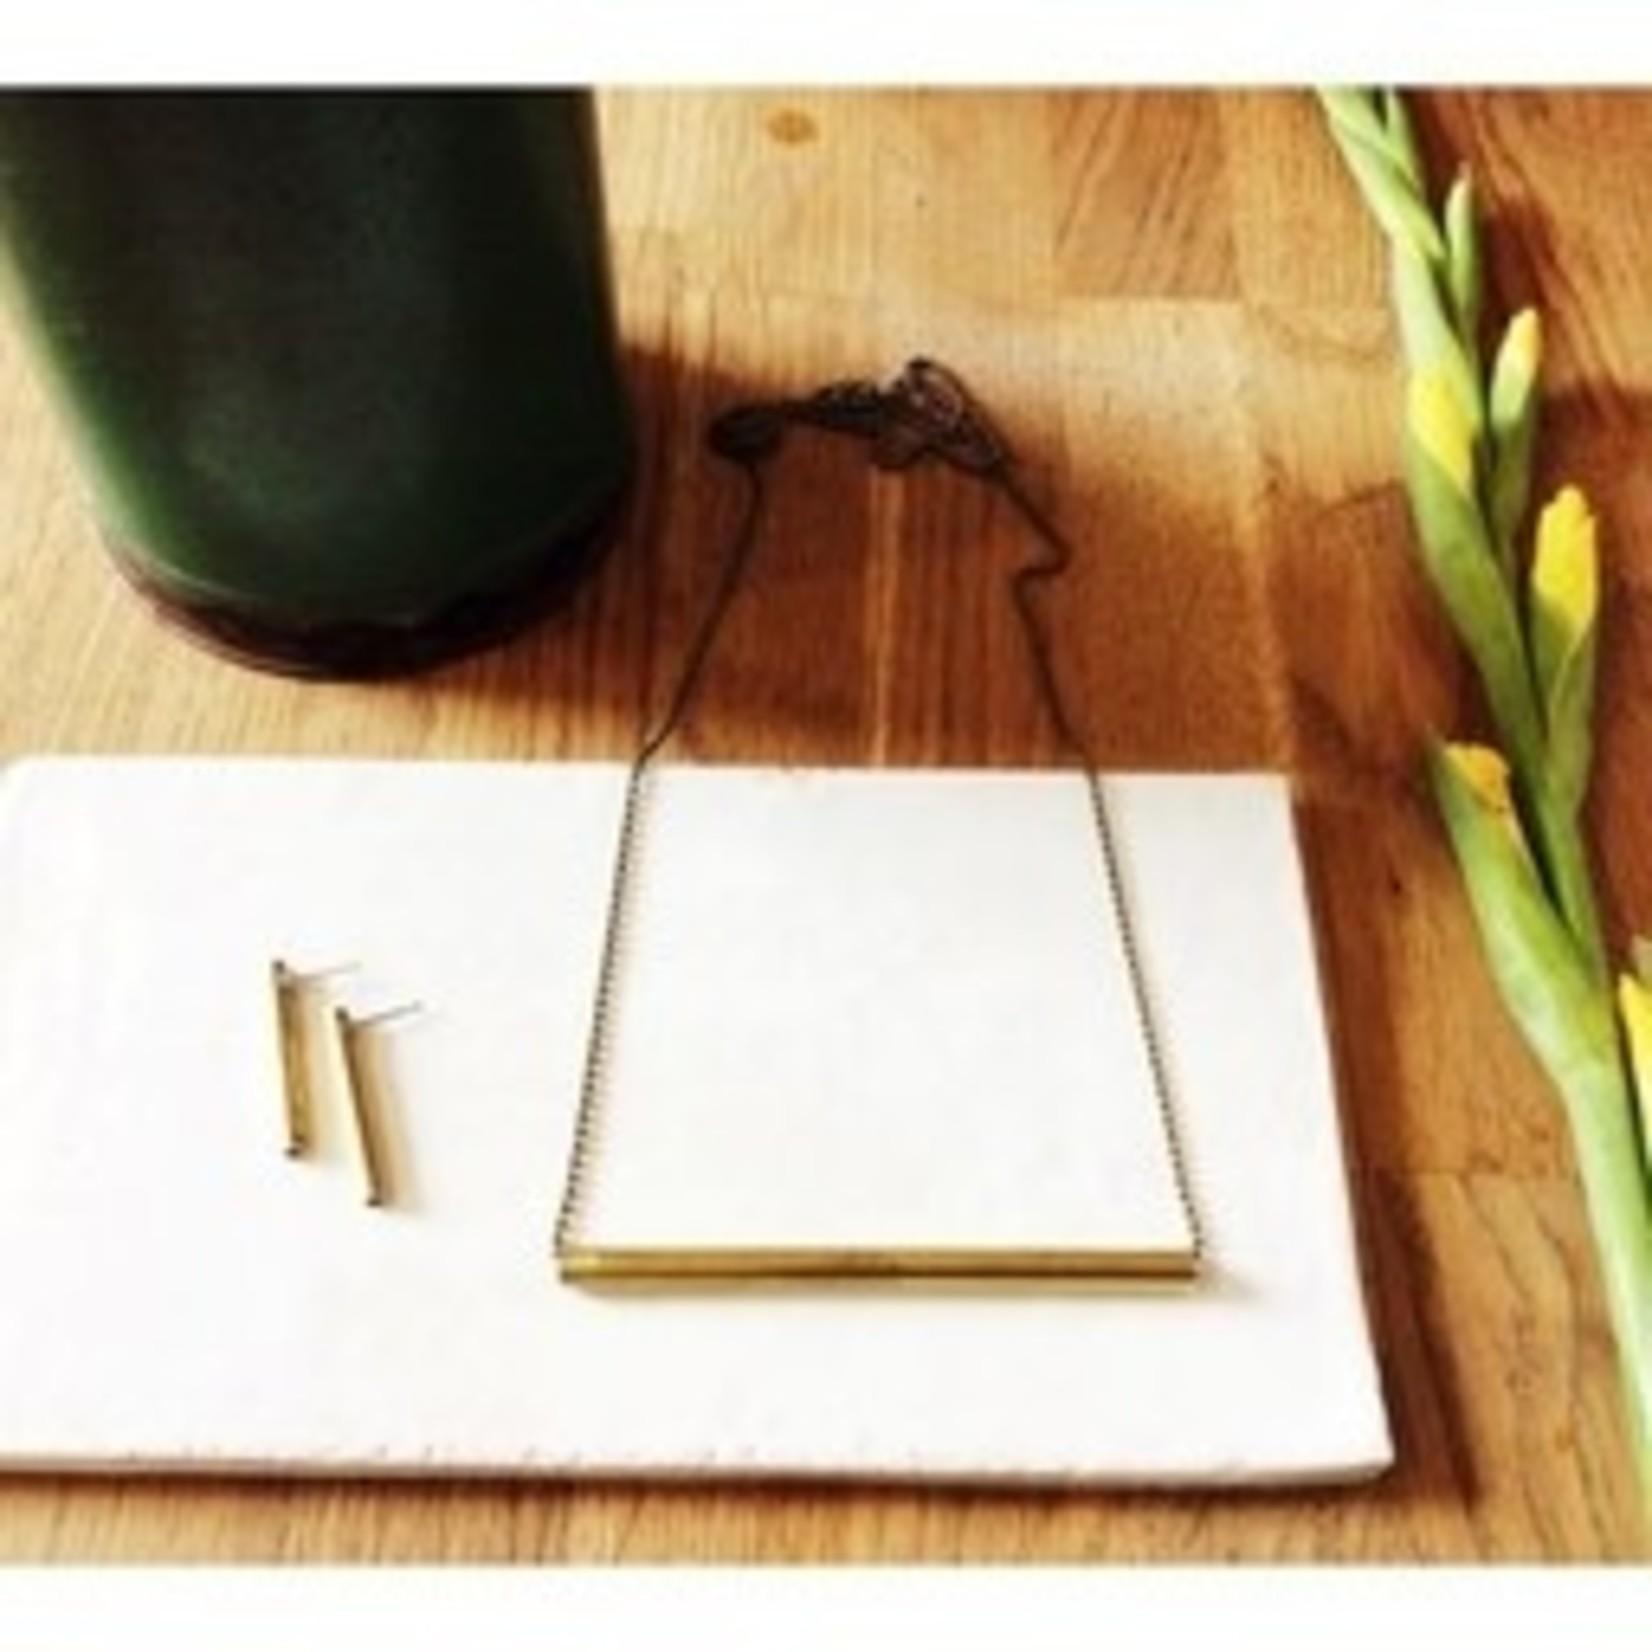 Inimini Homemade Ketting - Brass - Small - Bar